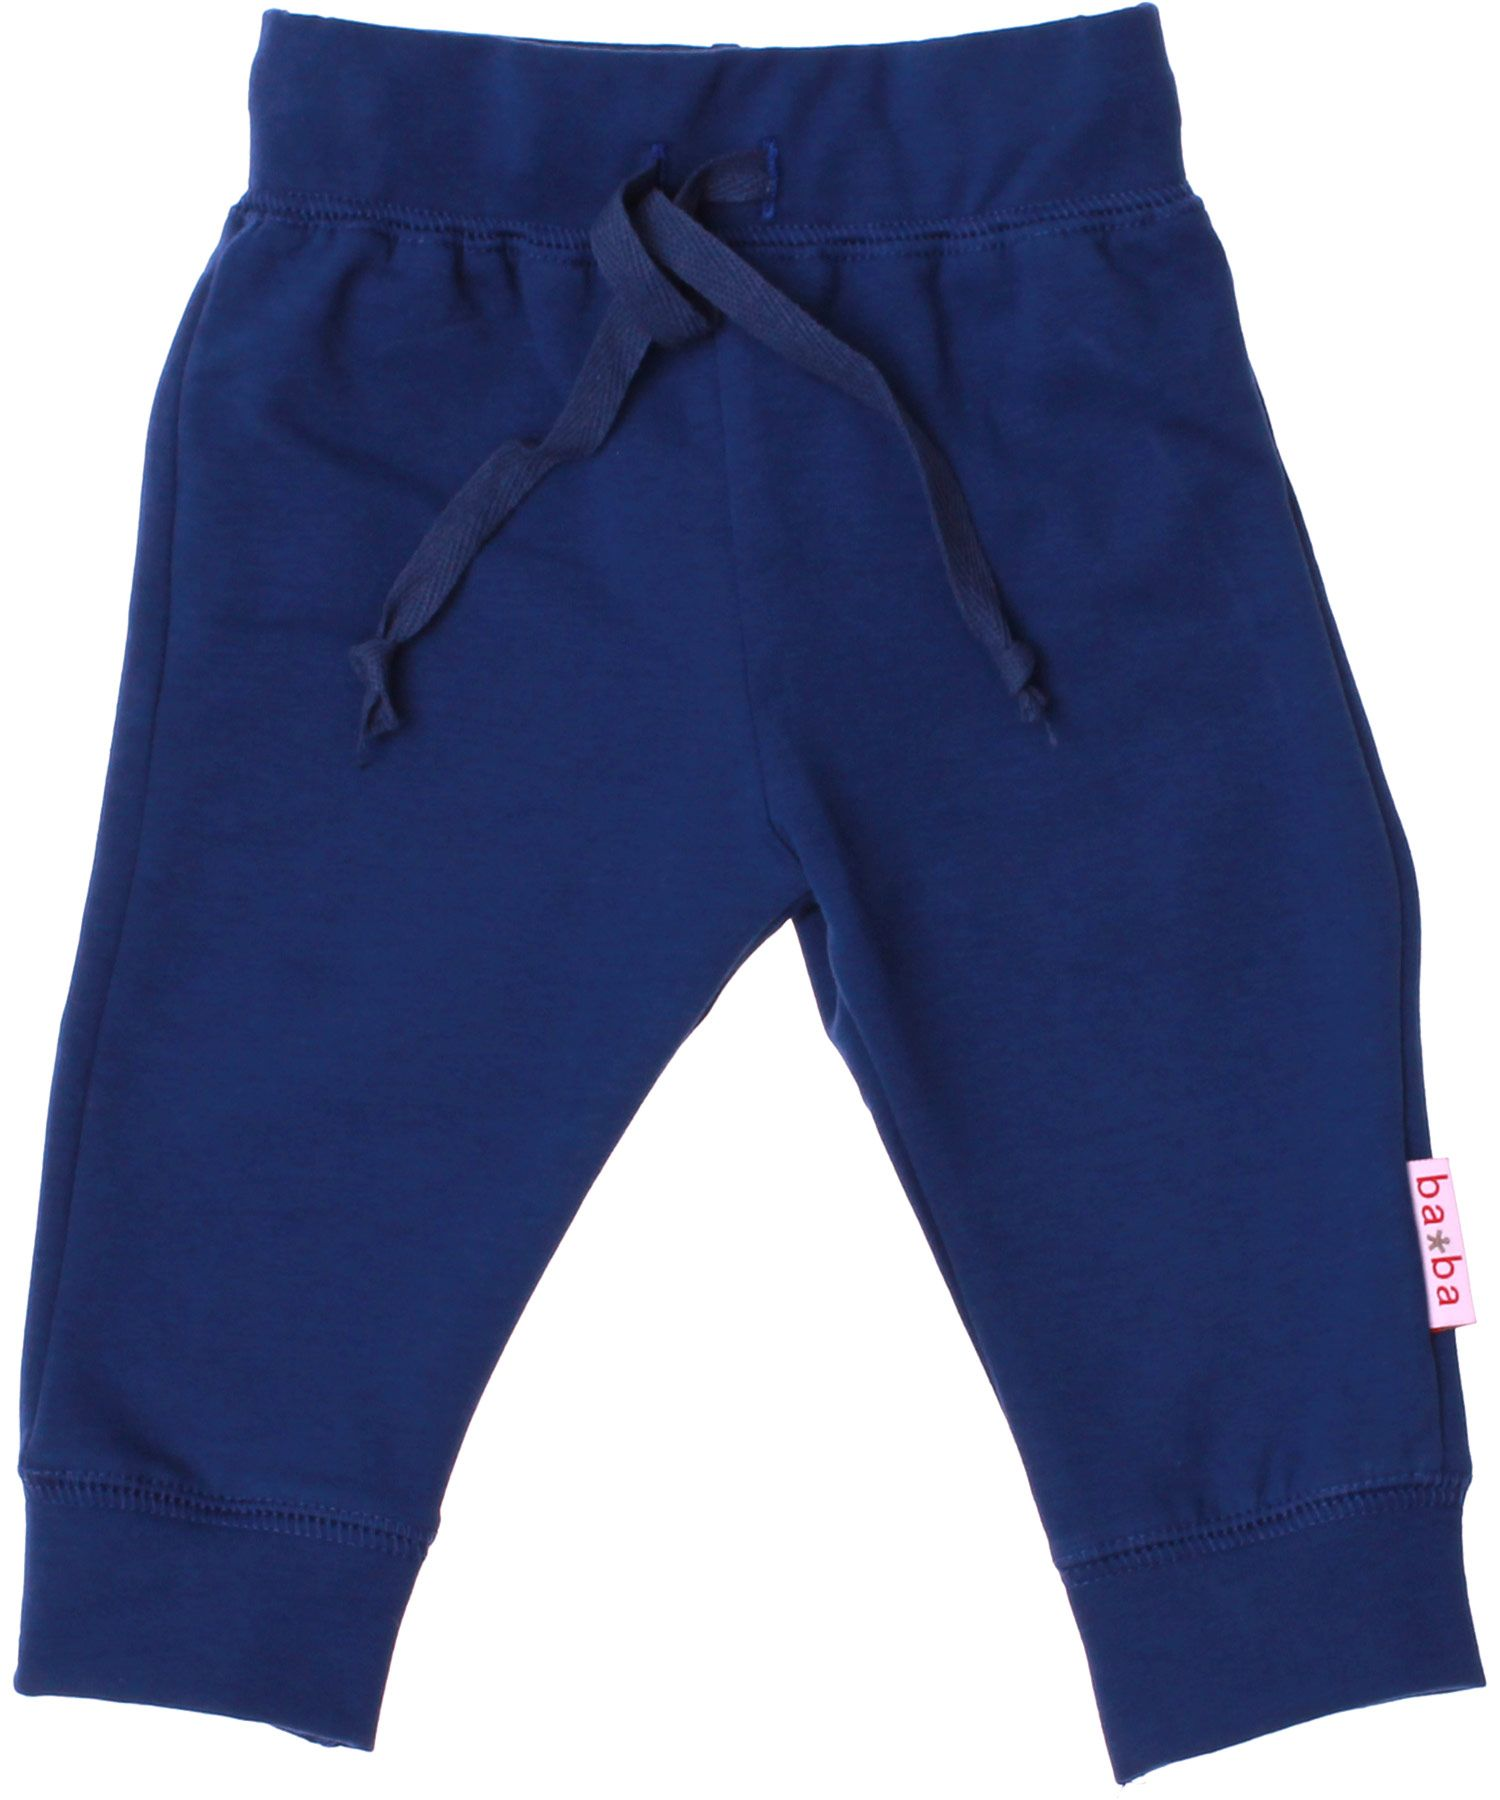 Baba Babywear hip blauw baby broekje. baba-babywear.nl.emilea.be